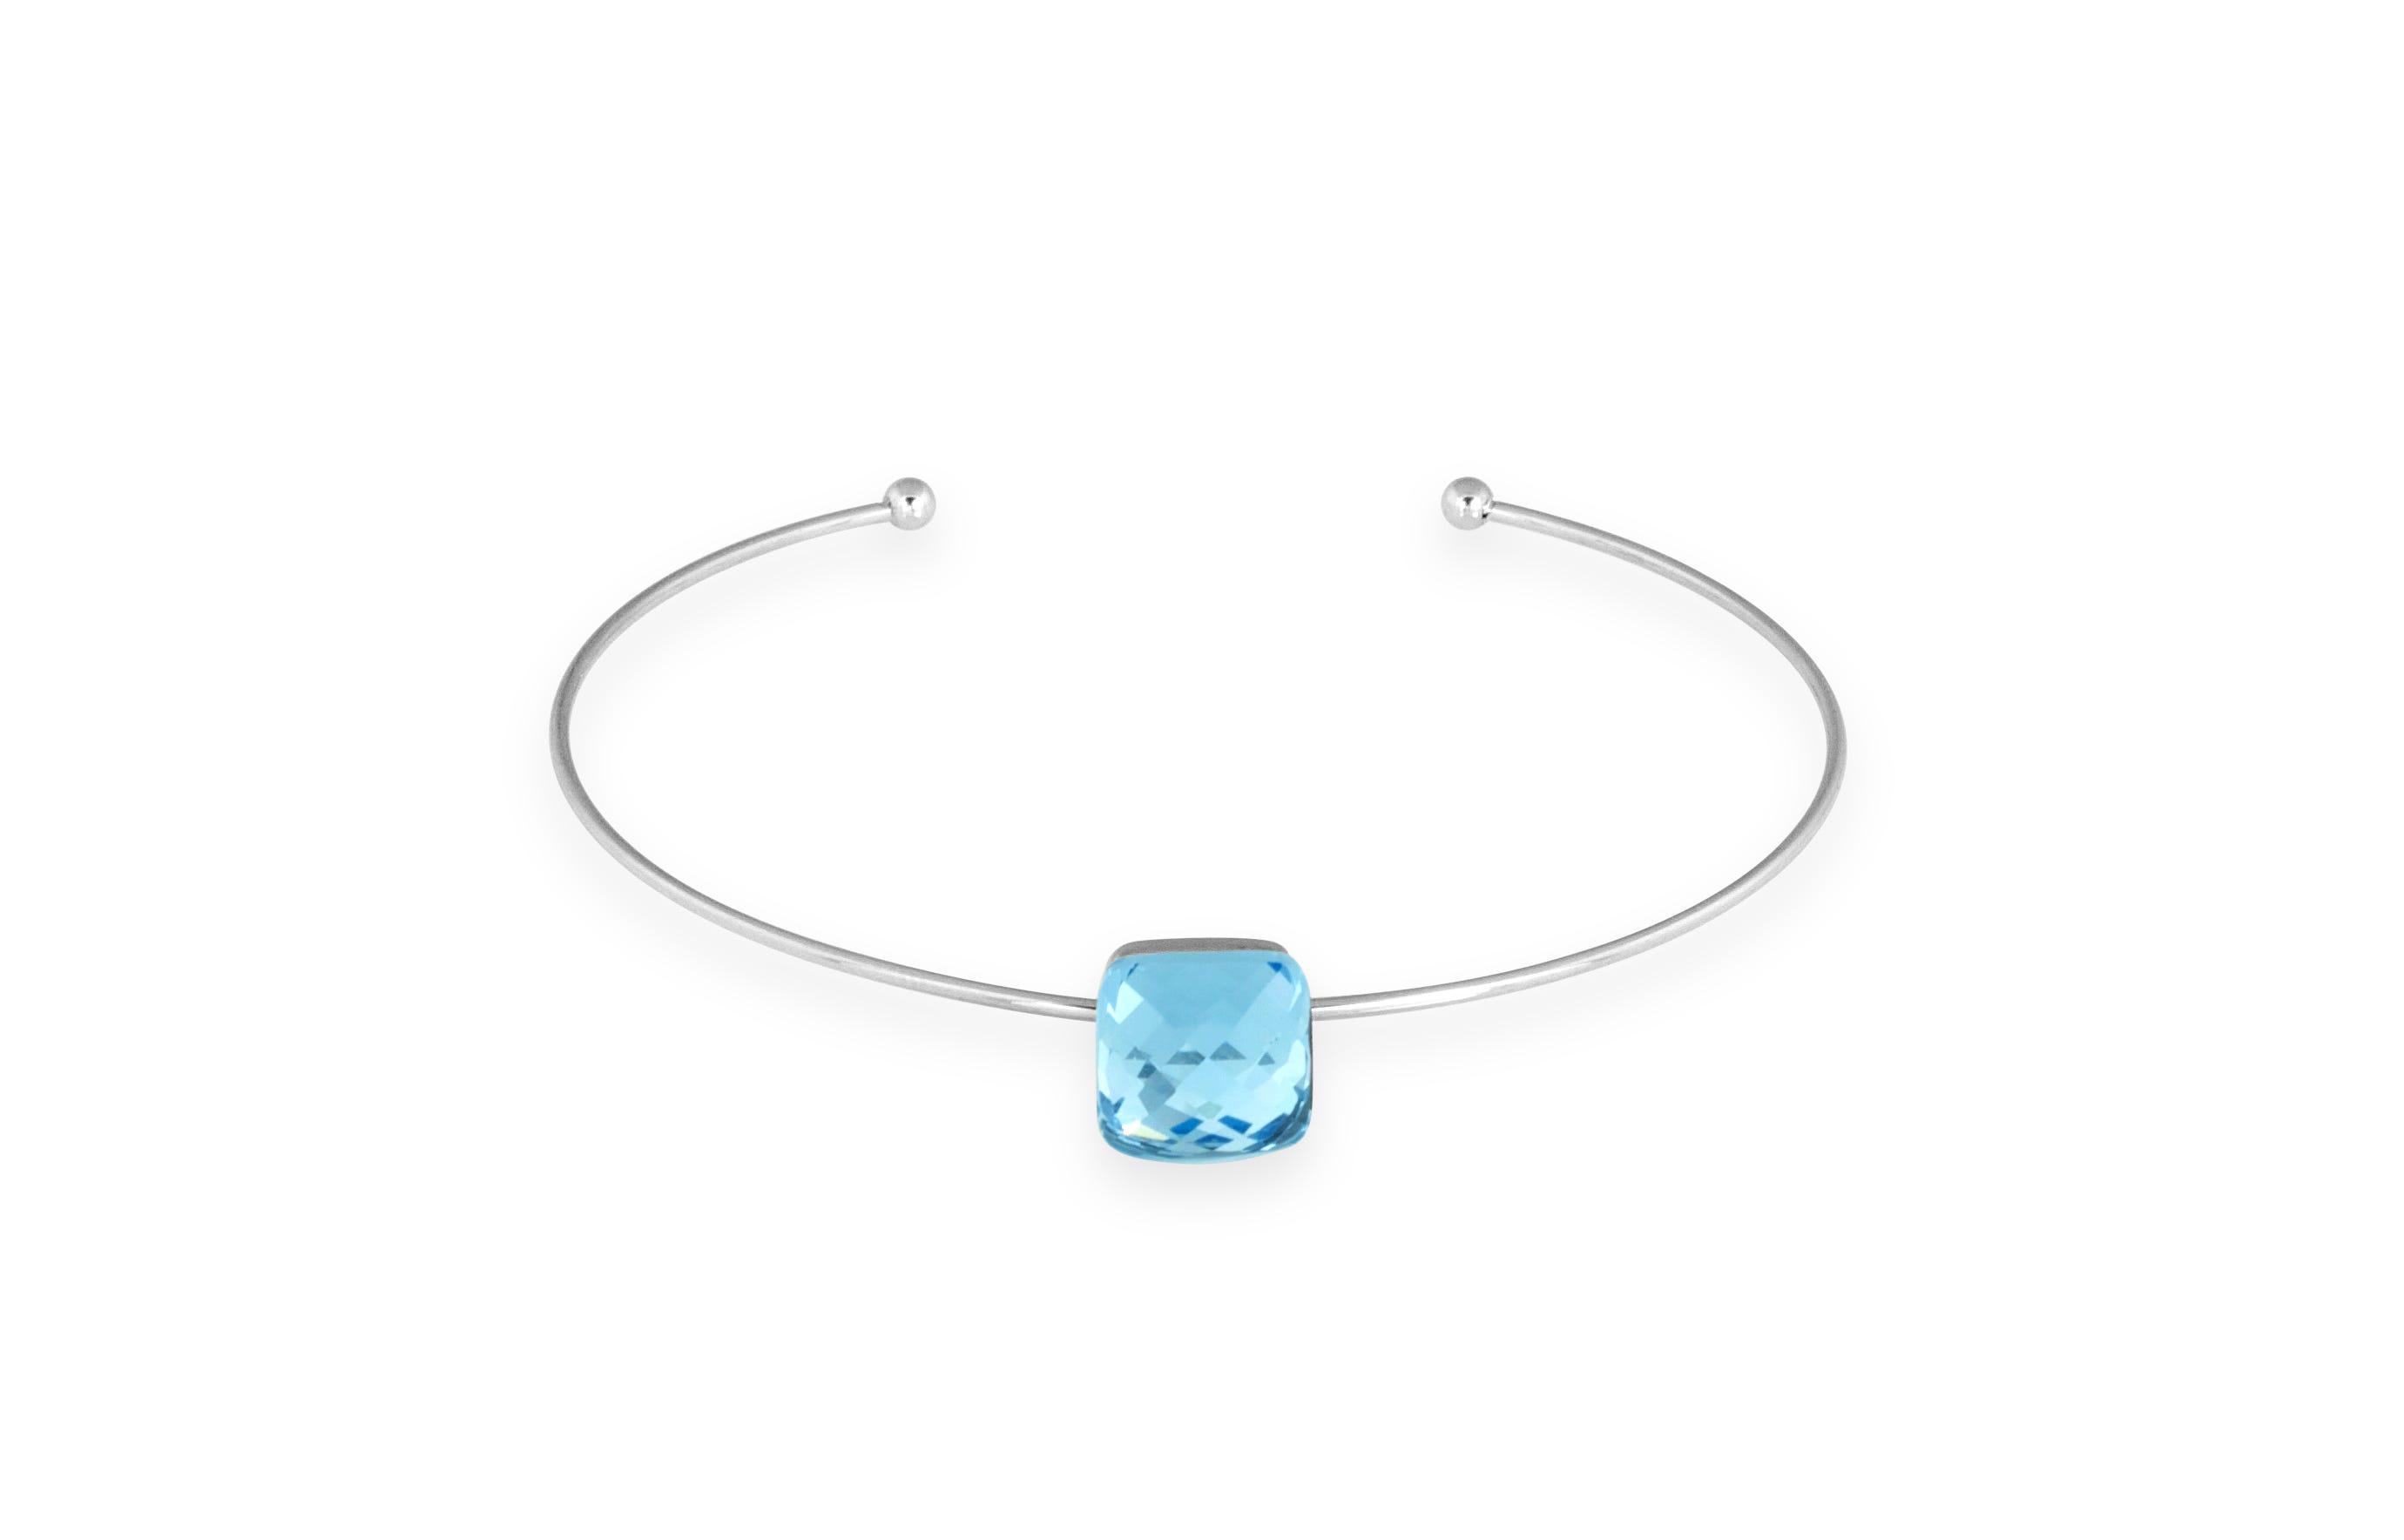 Lavender Glass Bangle Bracelet